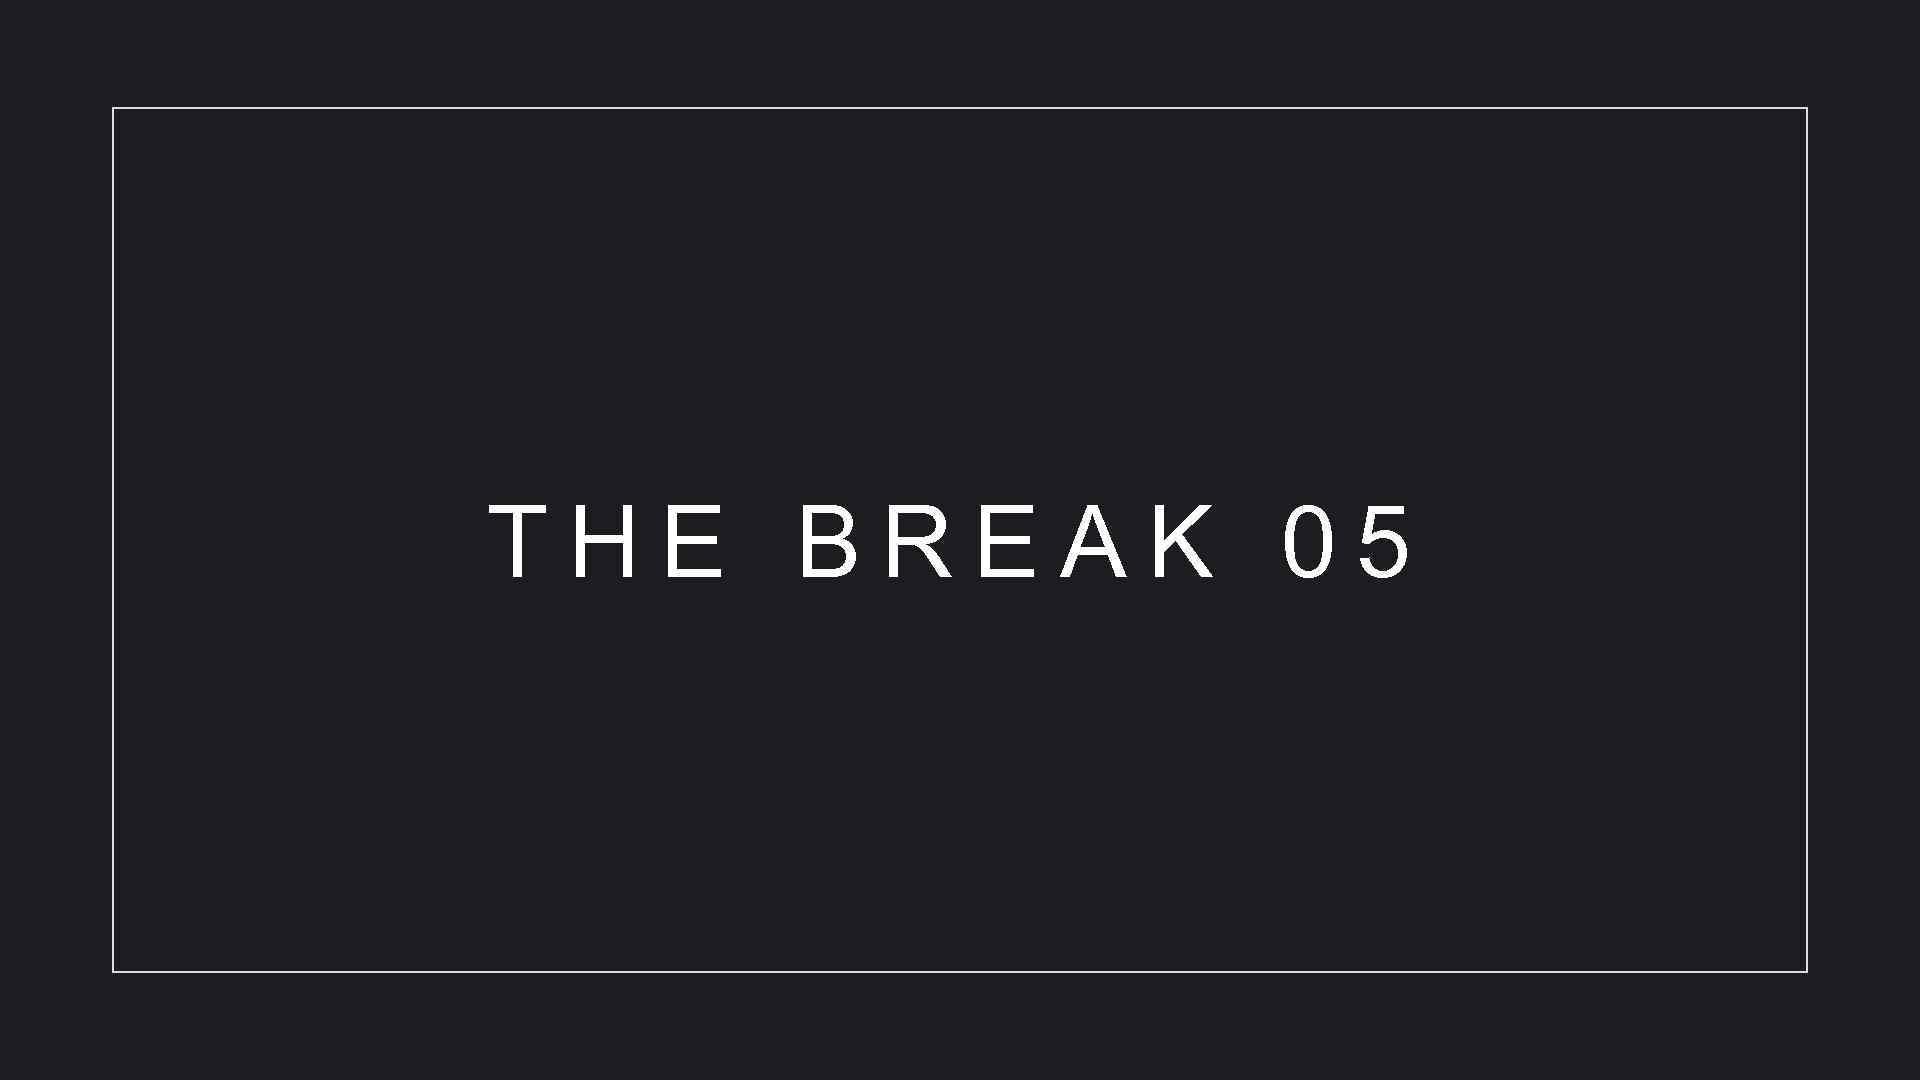 THE BREAK 05